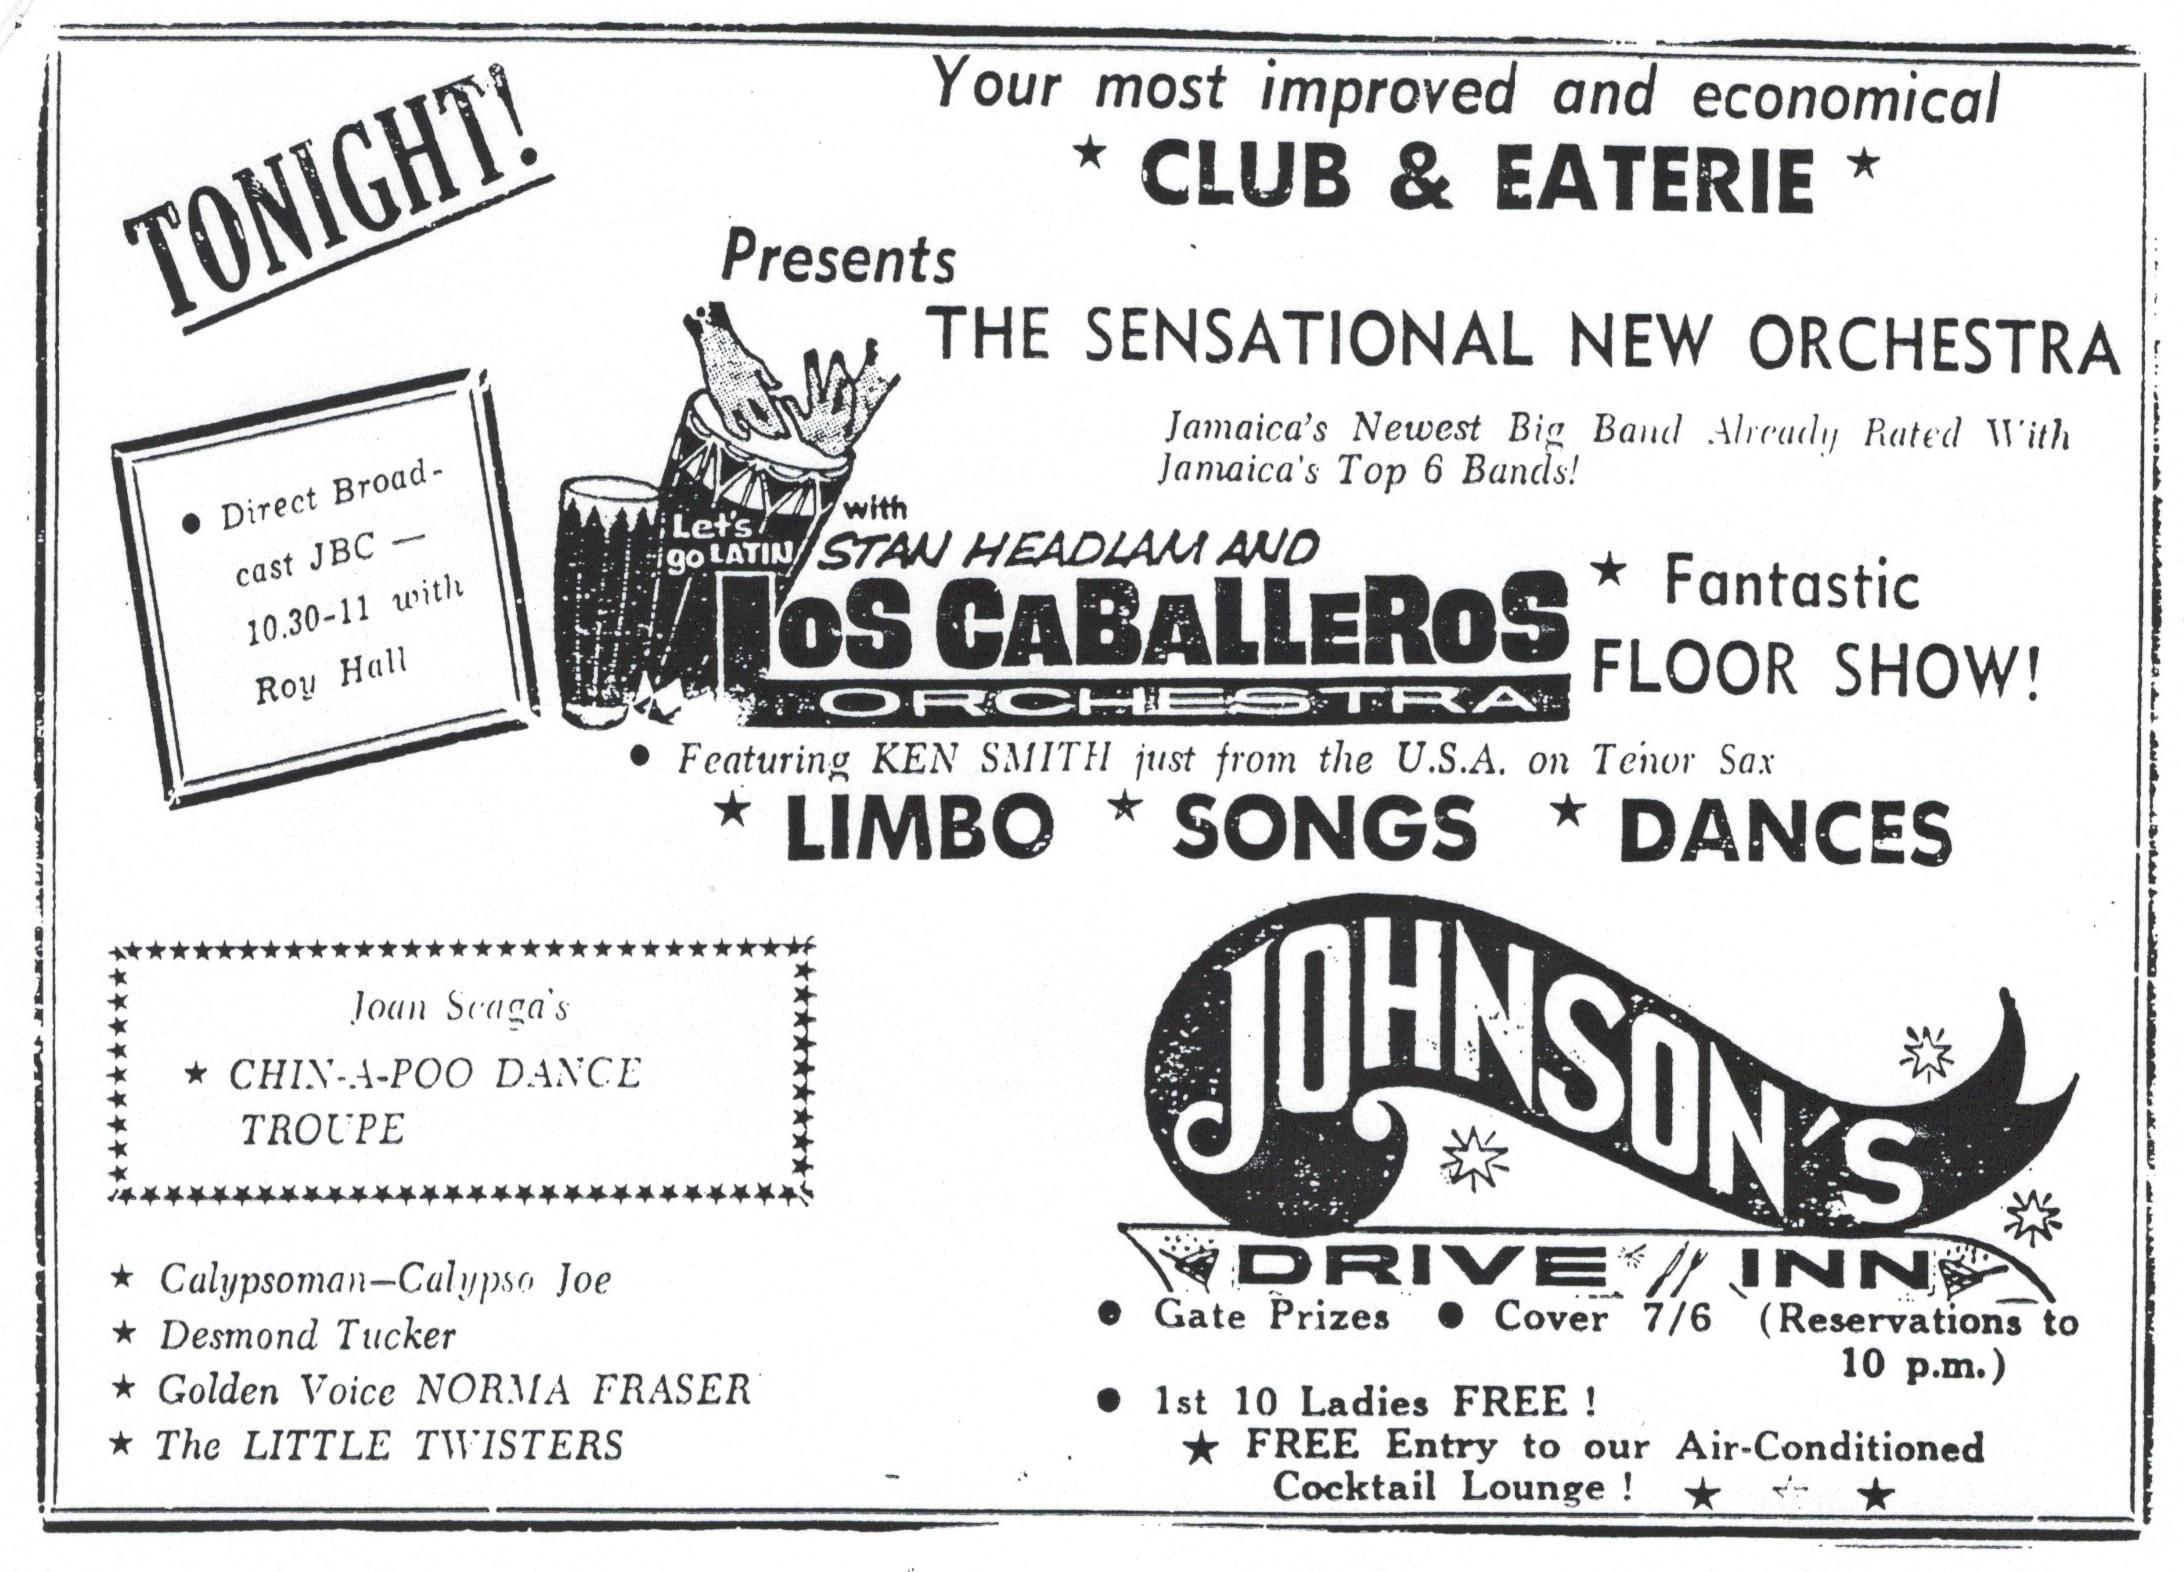 Johnson's Drive Inn Jamaica